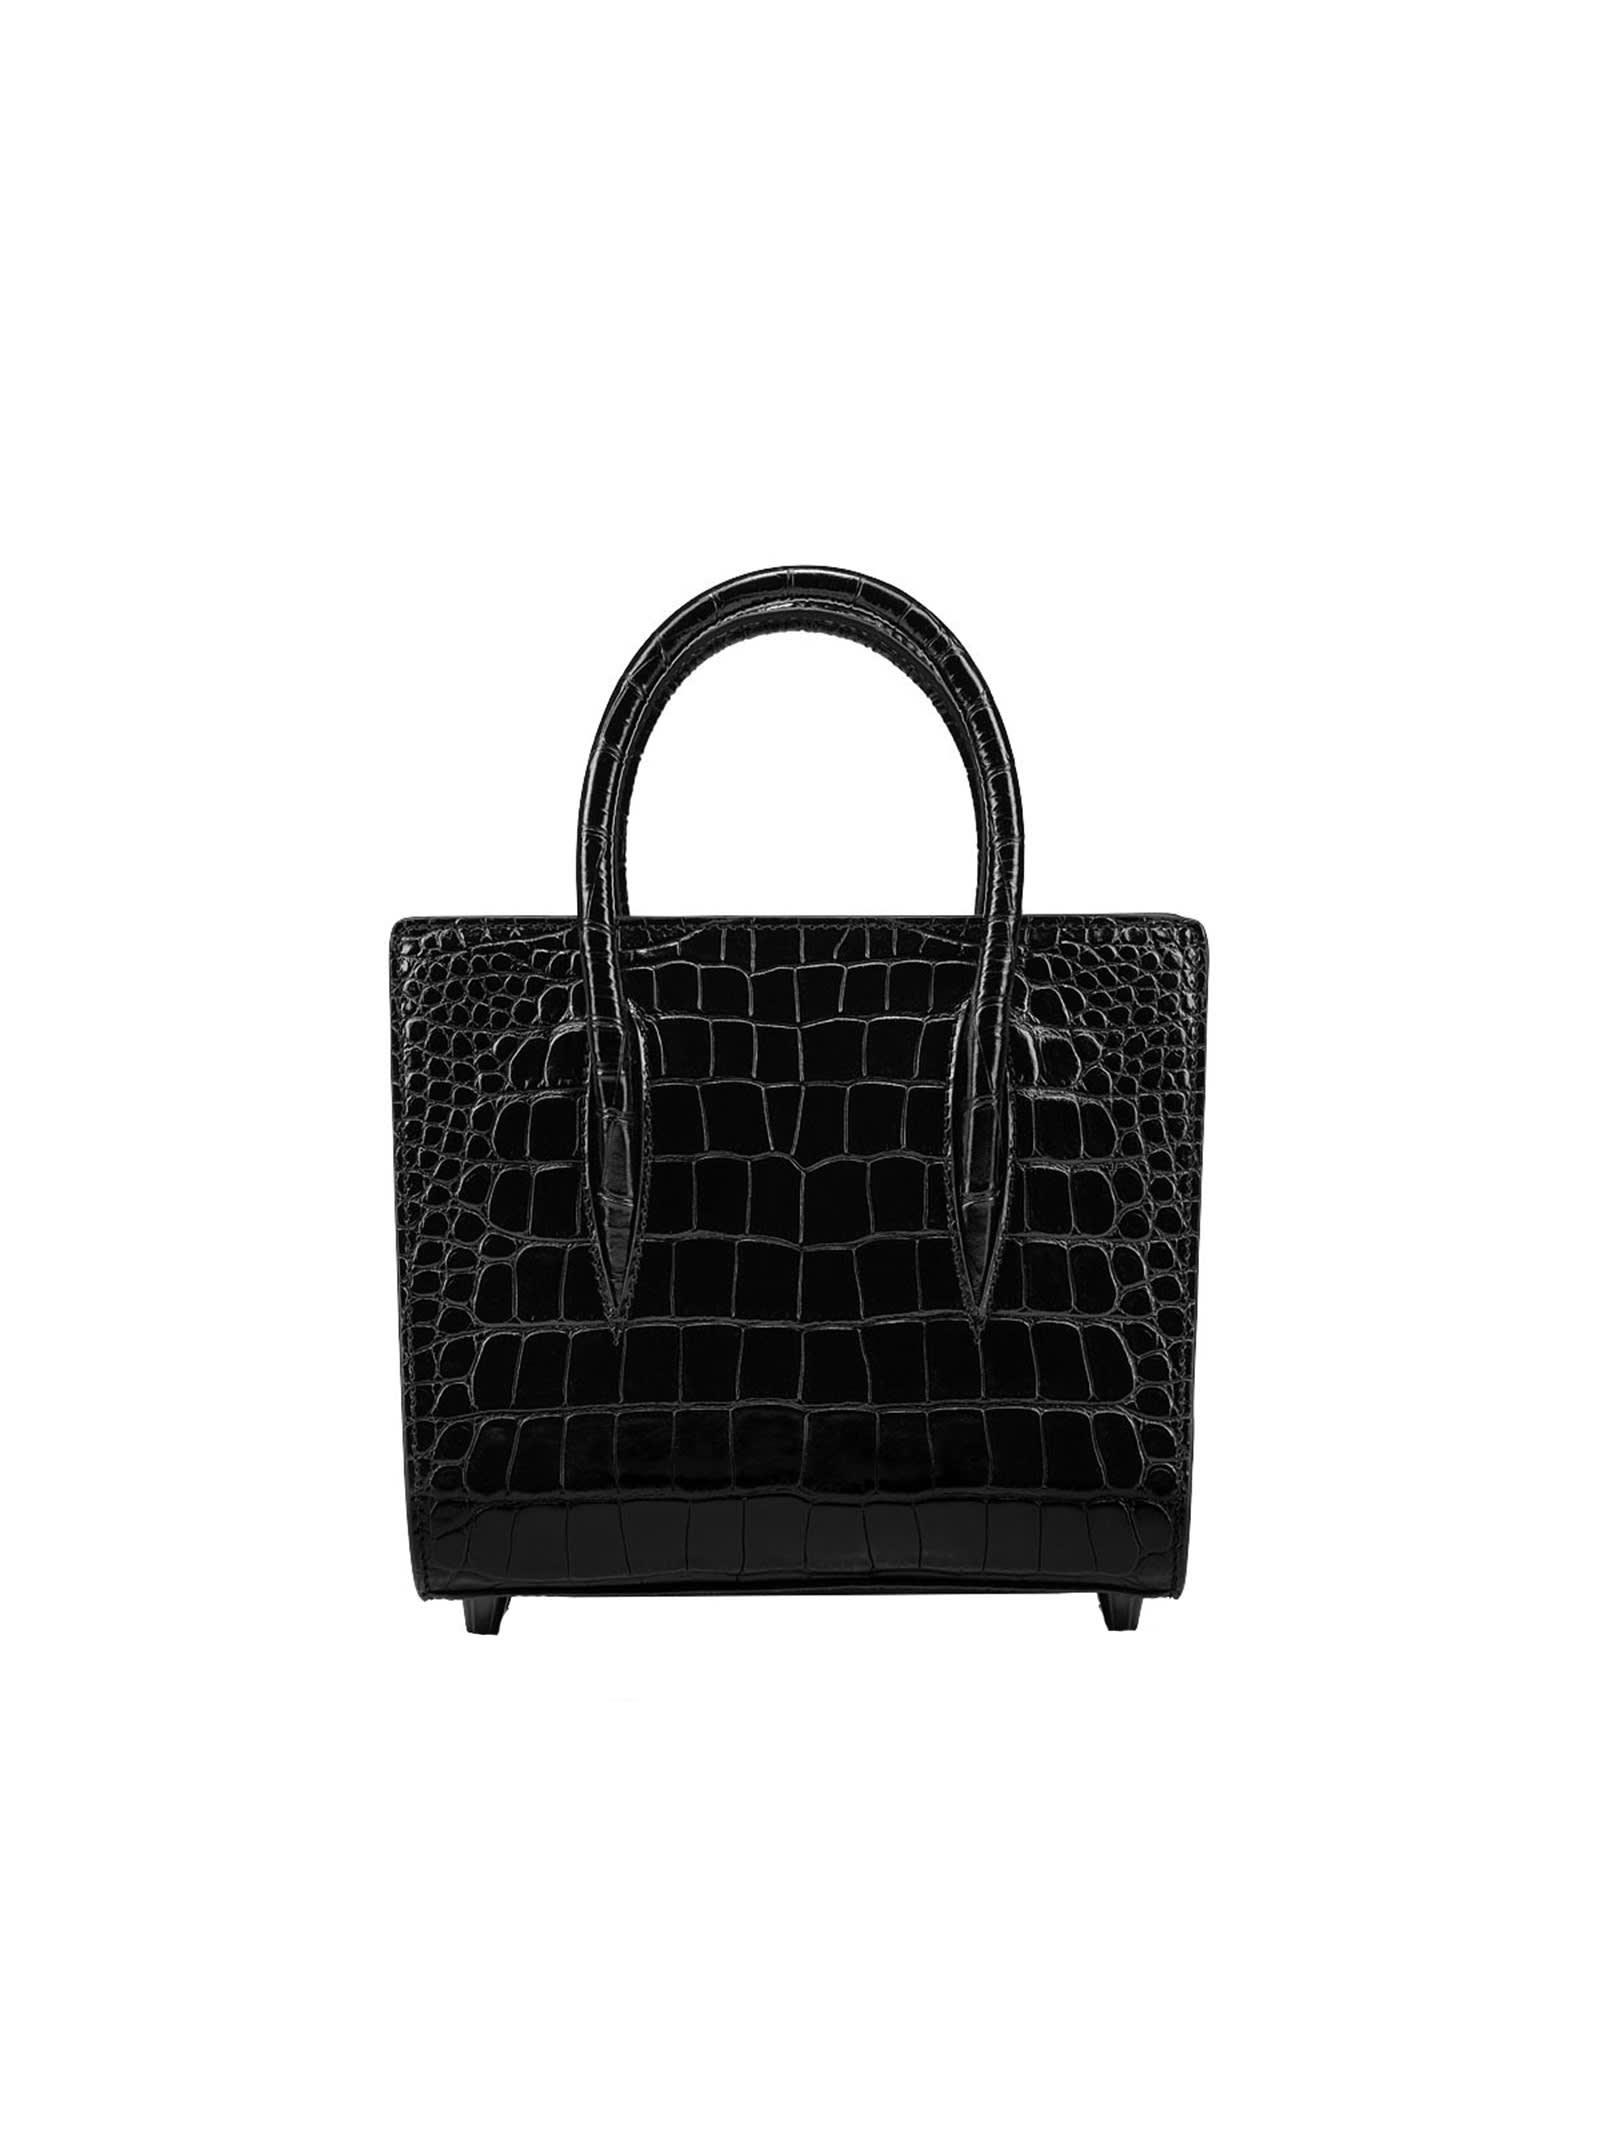 Christian Louboutin Teal Cocco Printed Leather Paloma Small Bag